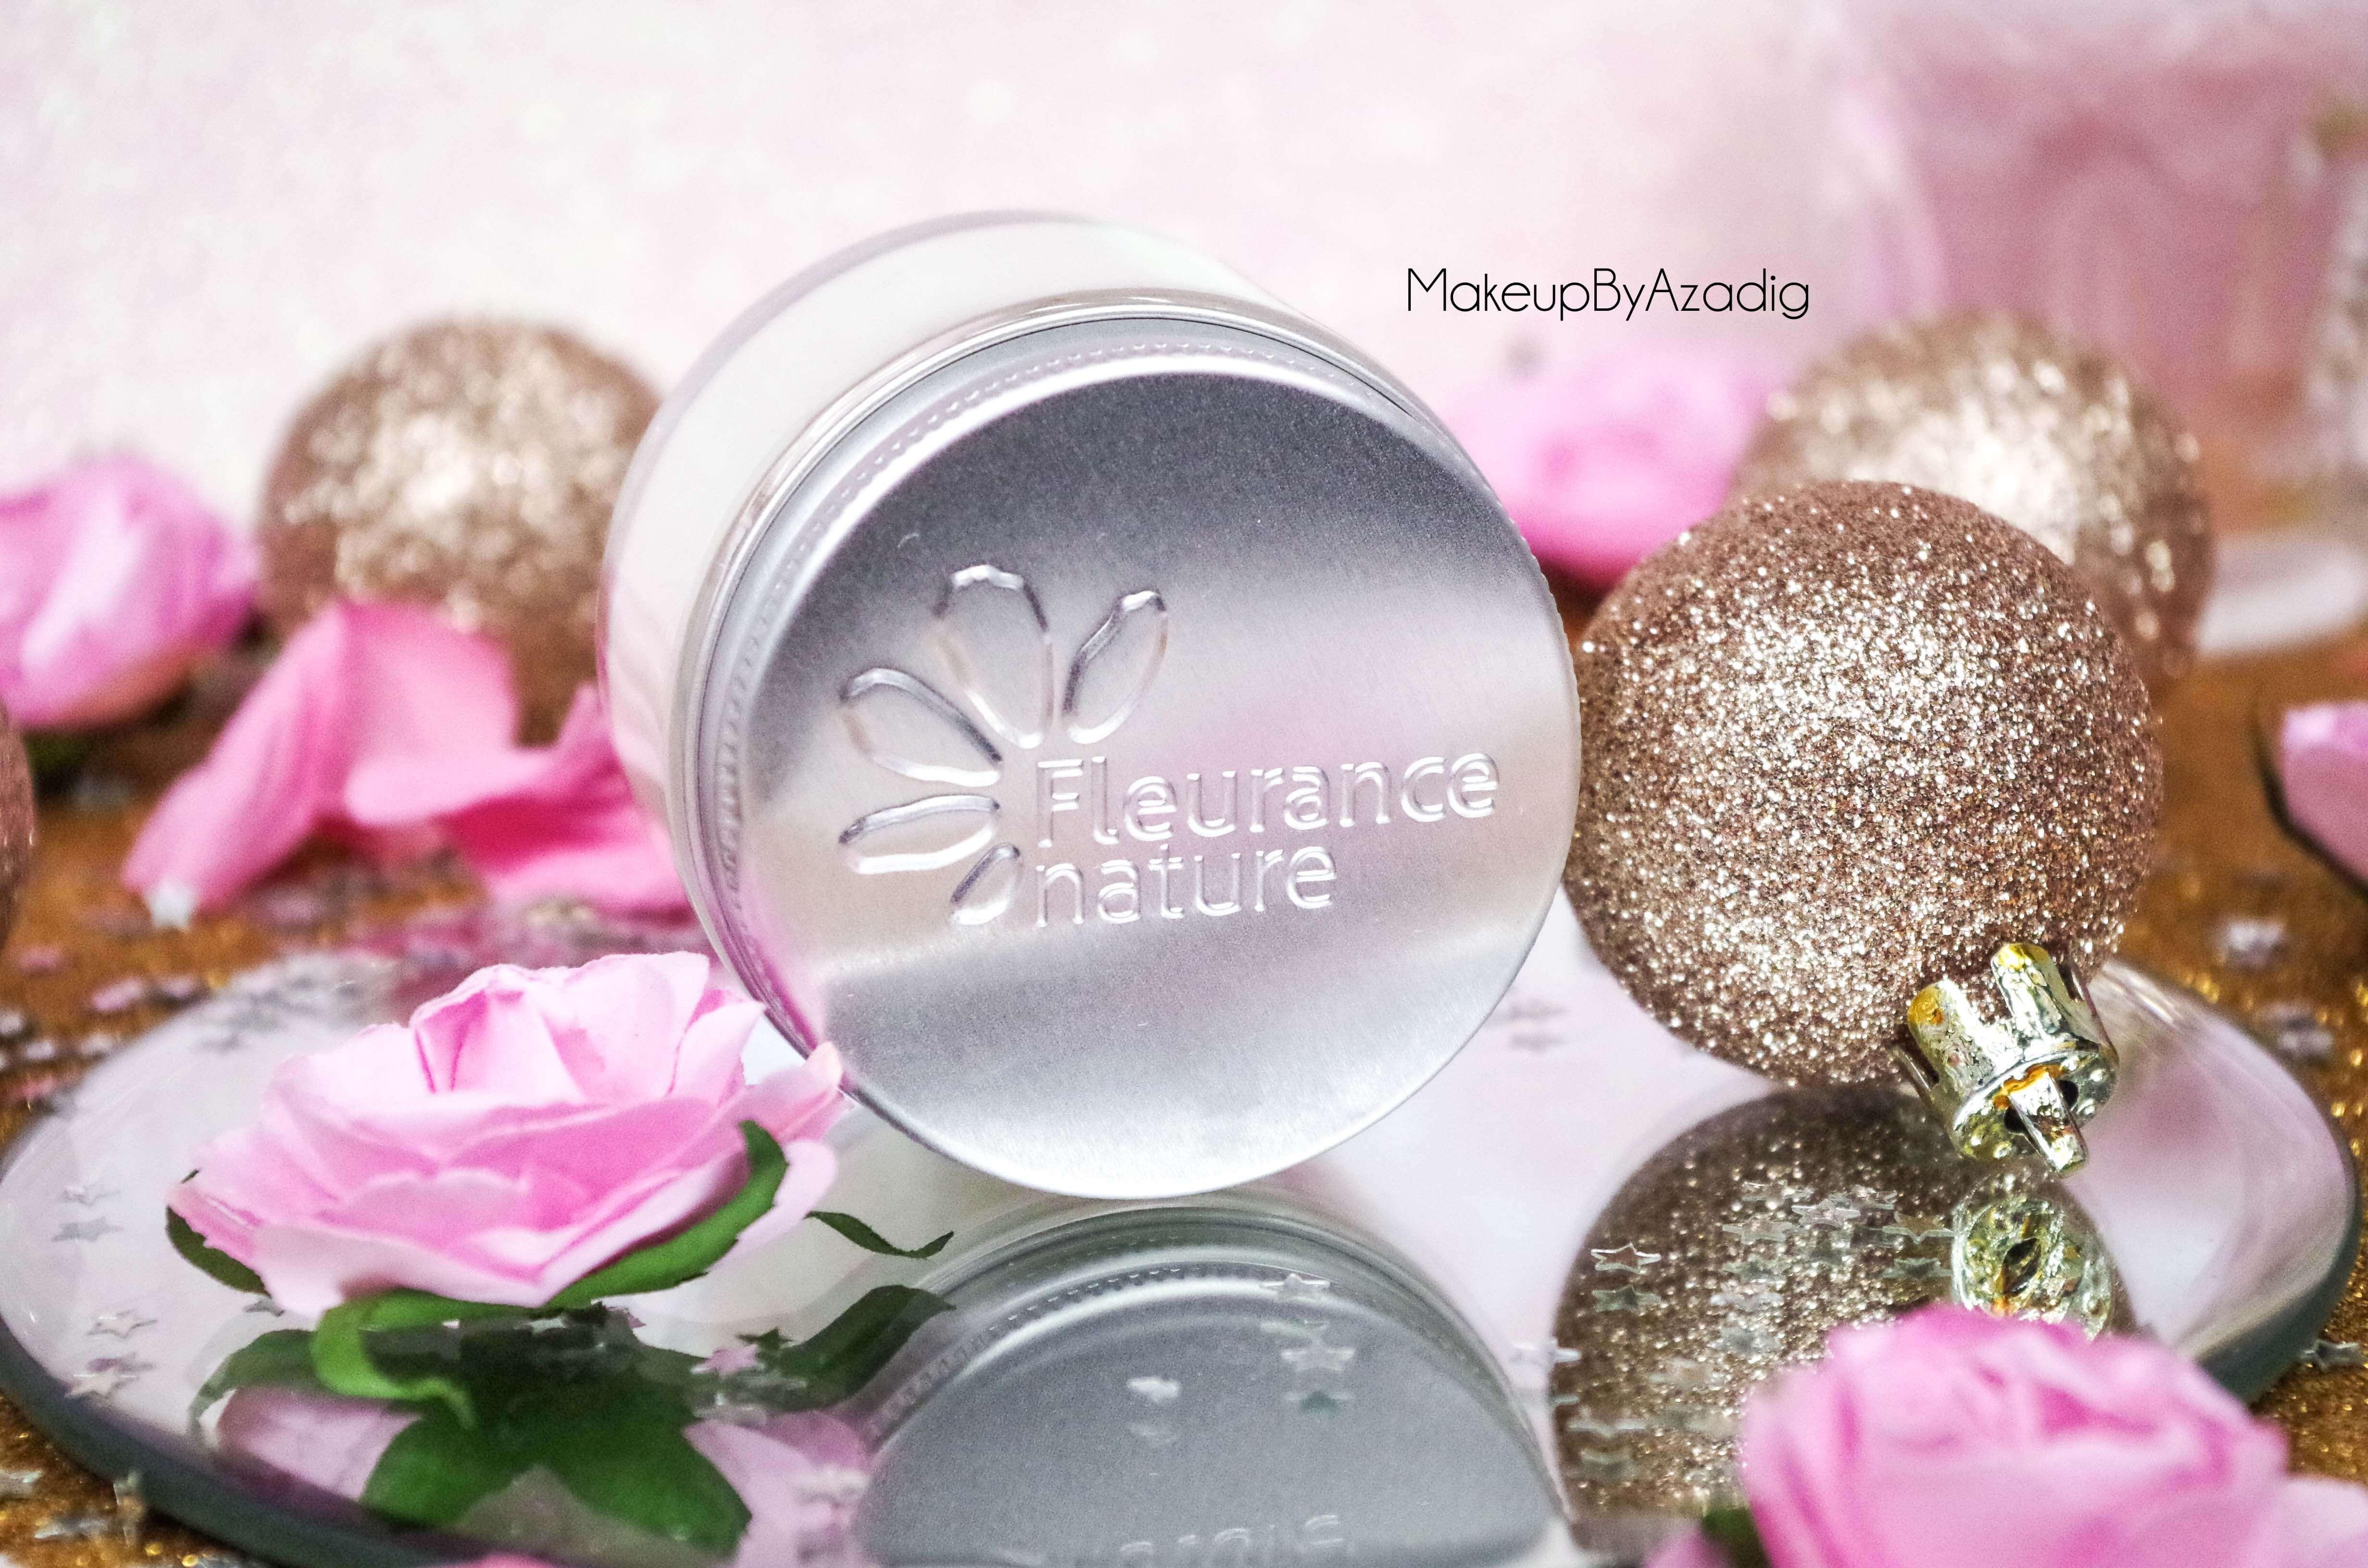 creme-nutrition-intense-serum-nuit-fleur-immortelle-fleurance-nature-makeupbyazadig-revue-prix-avis-logo